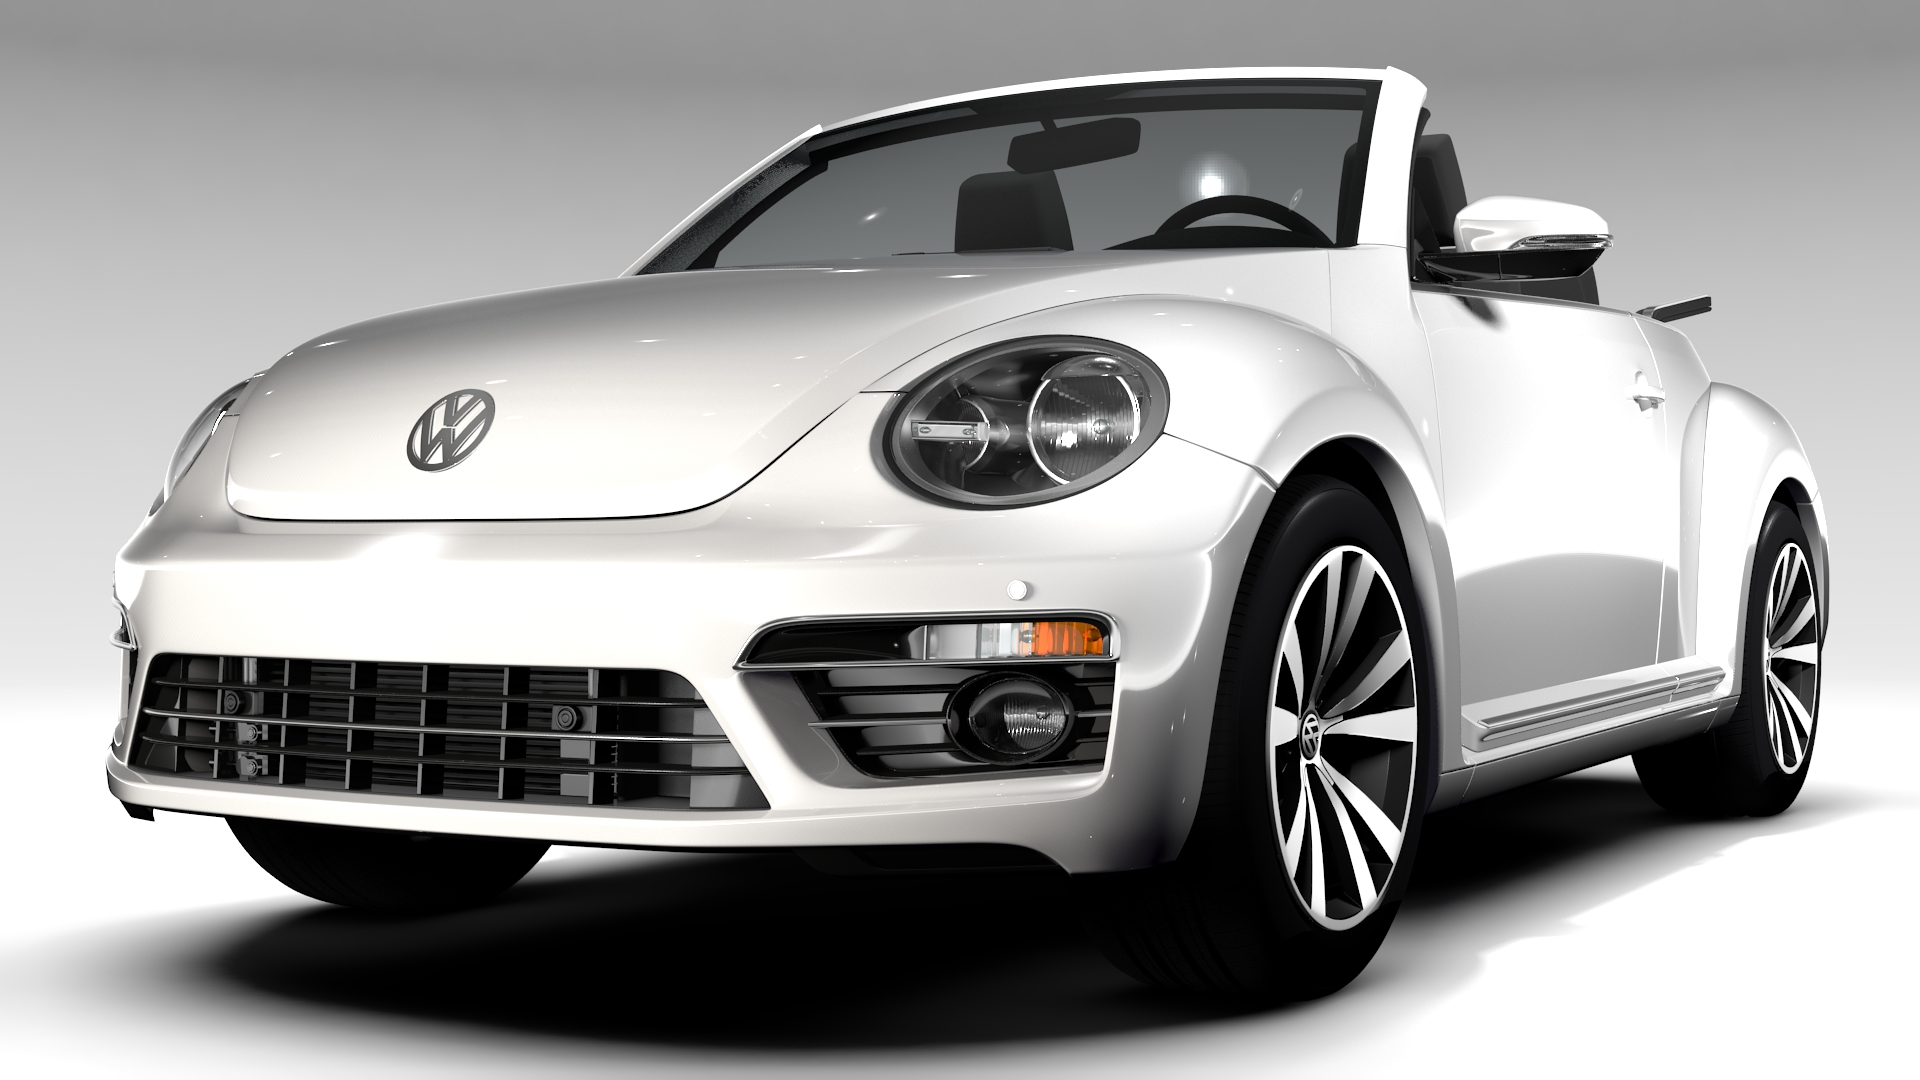 vw beetle cabriolet 2017 3d model 3ds max fbx c4d lwo ma mb hrc xsi obj 221590